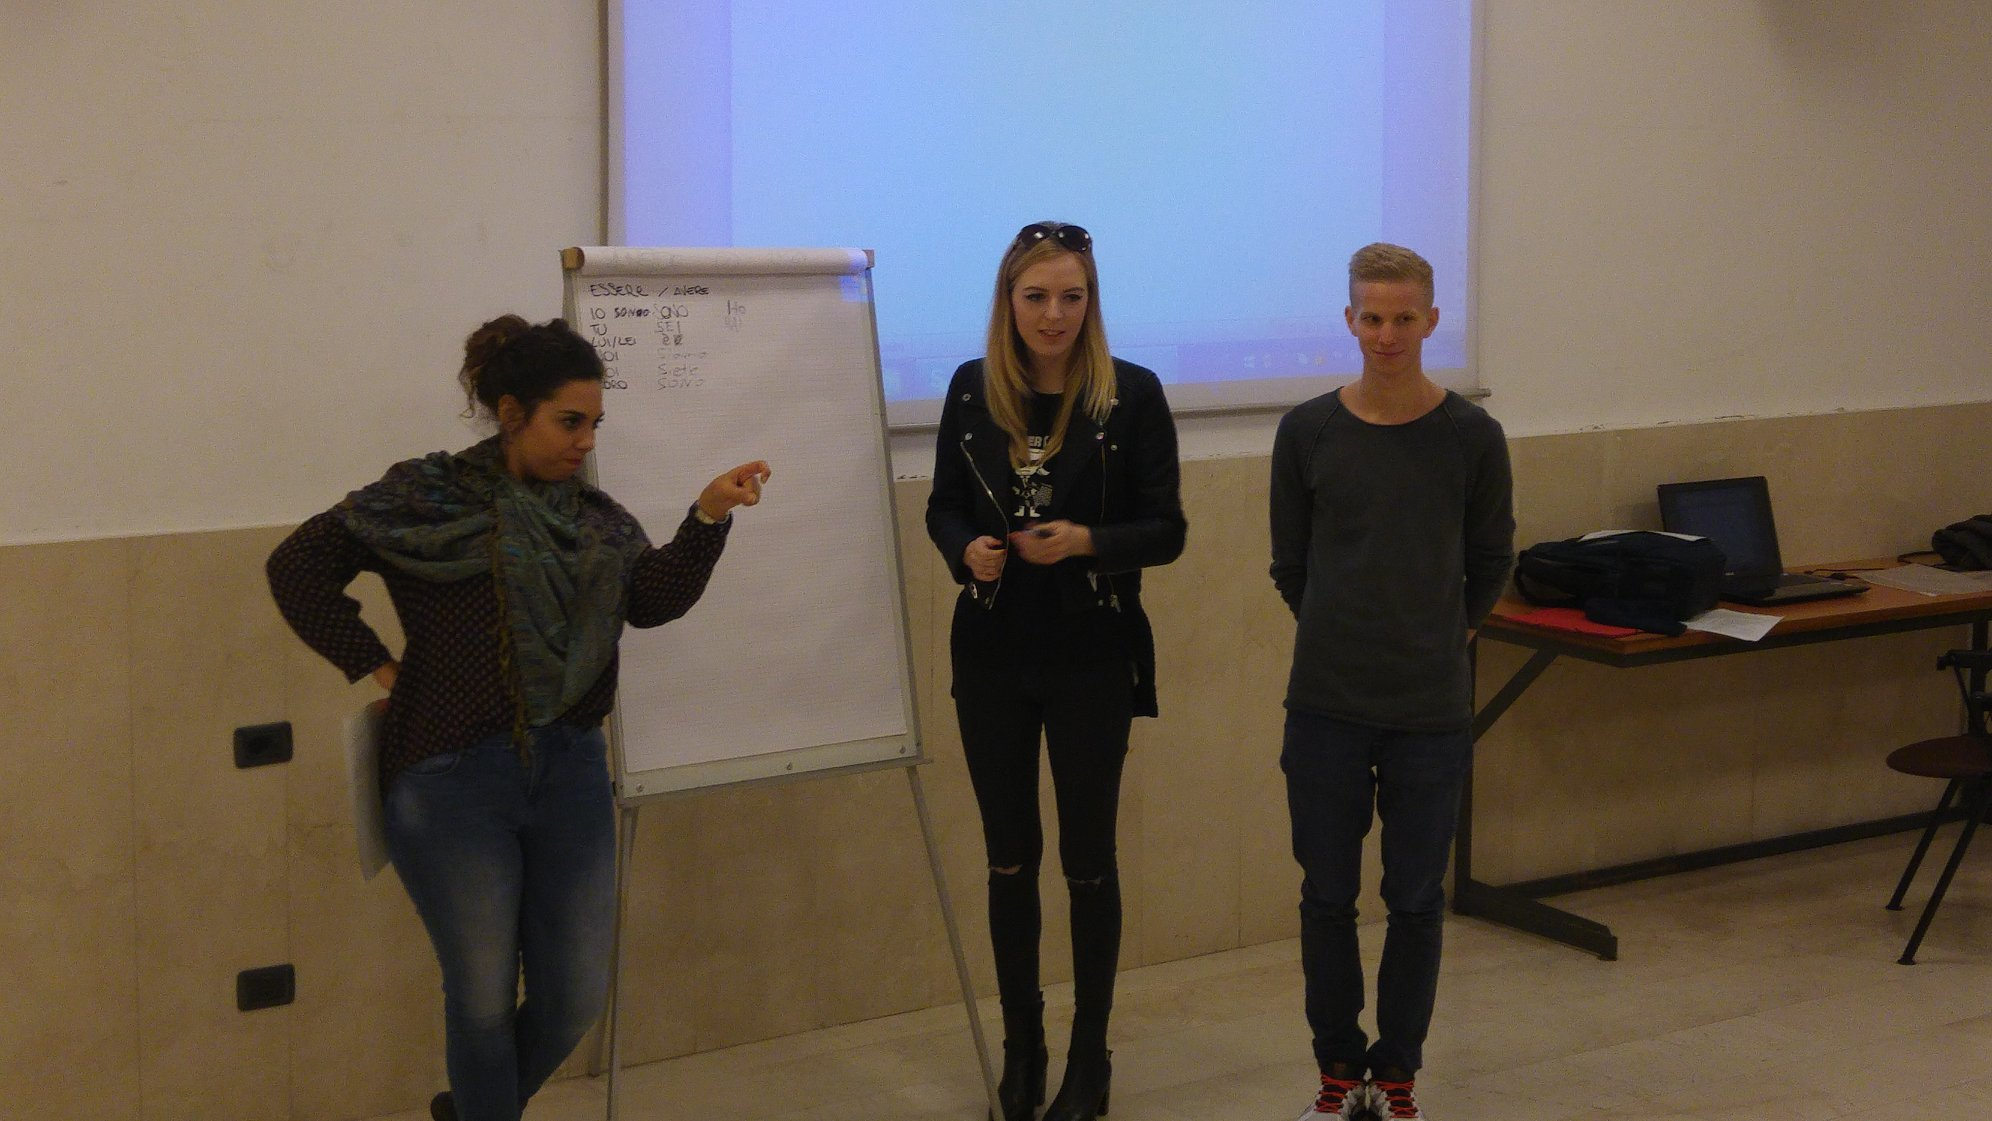 http://www.giovaniperleuropa.org/erasmus-ka1-training-course/